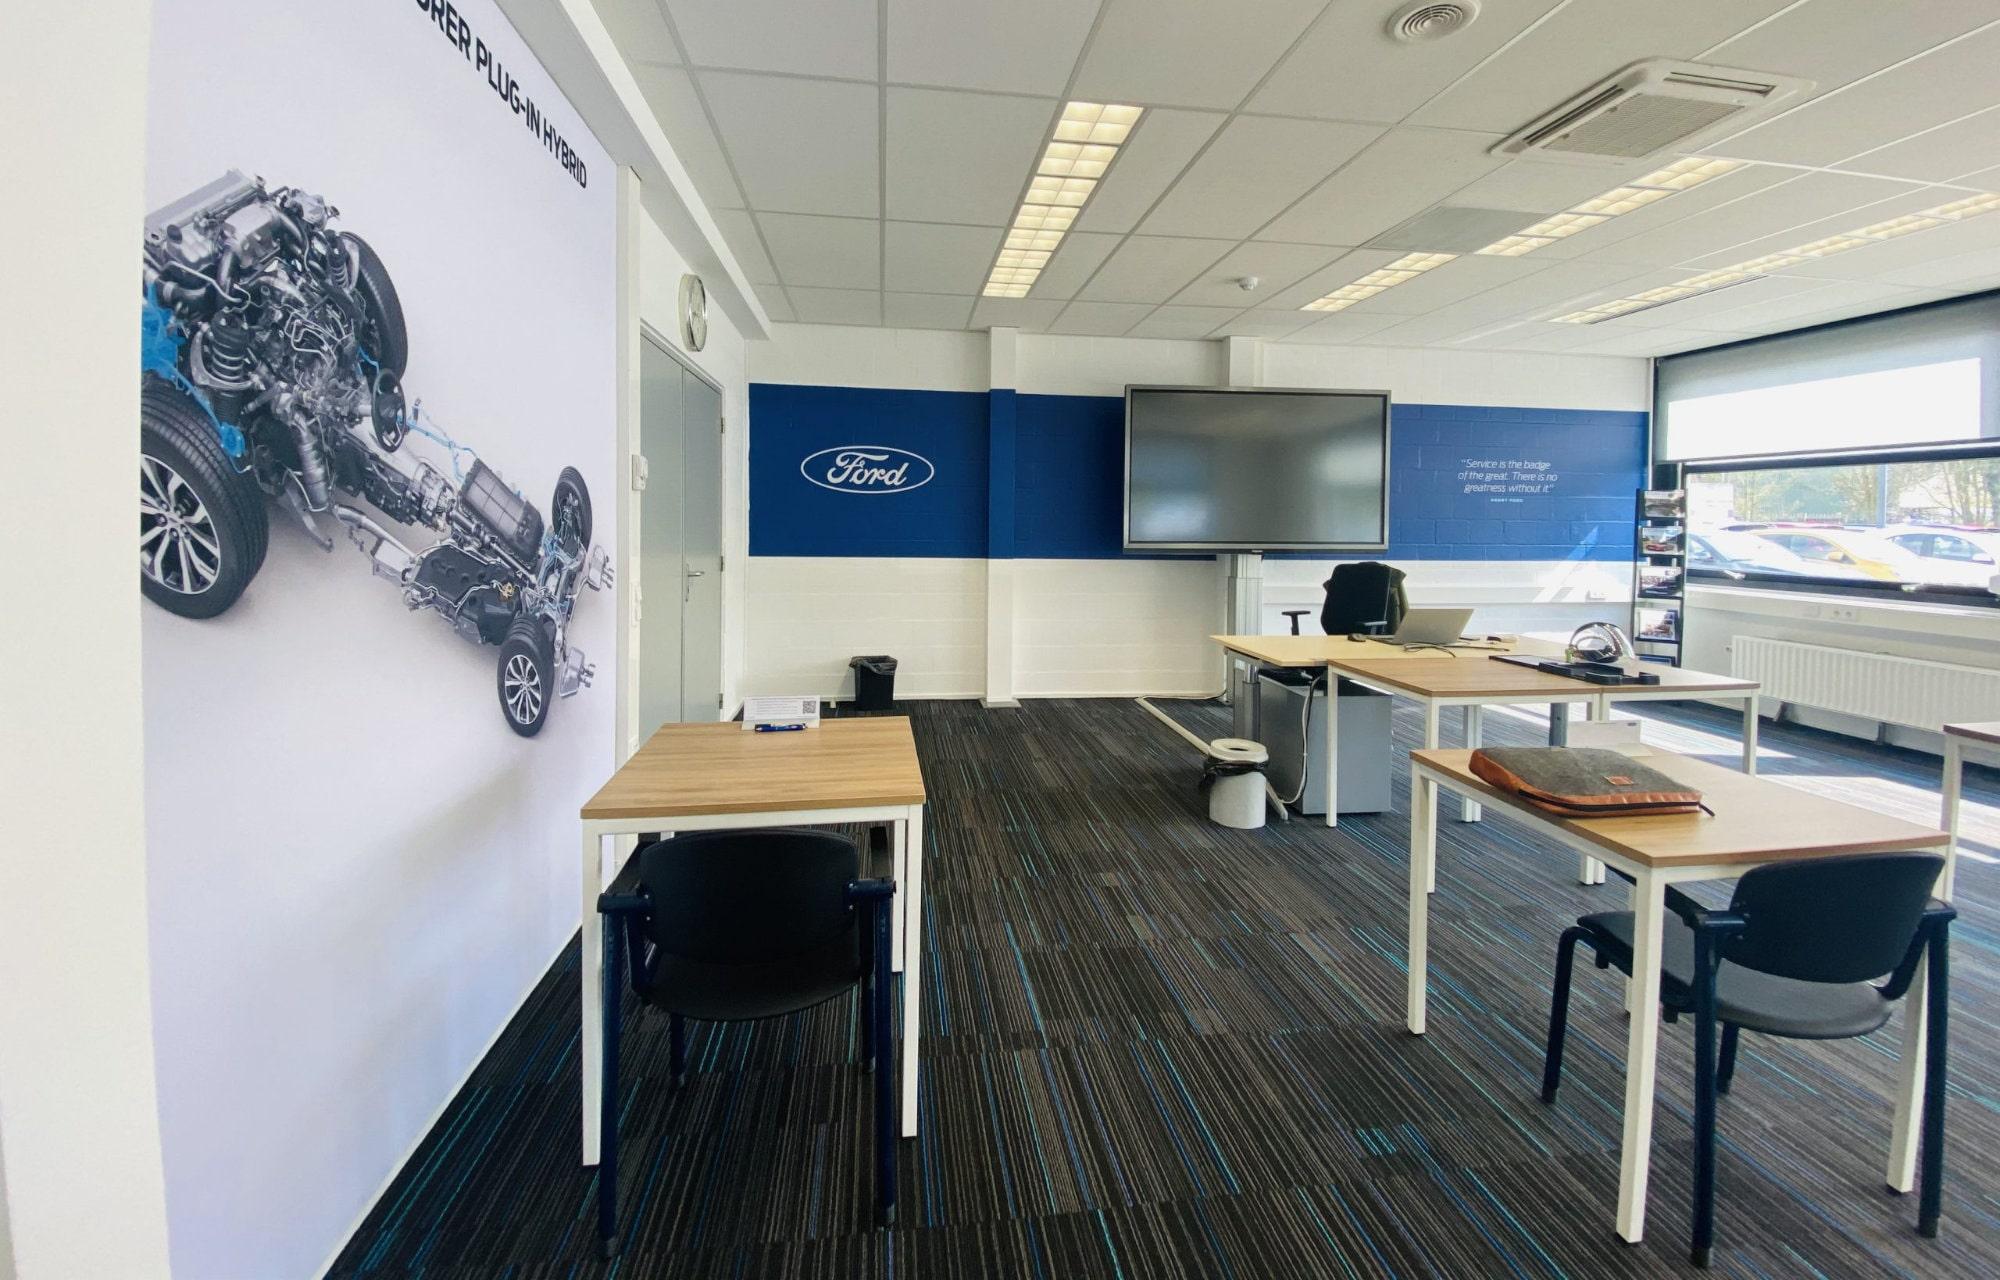 Ford Training Academy in Nieuwegein